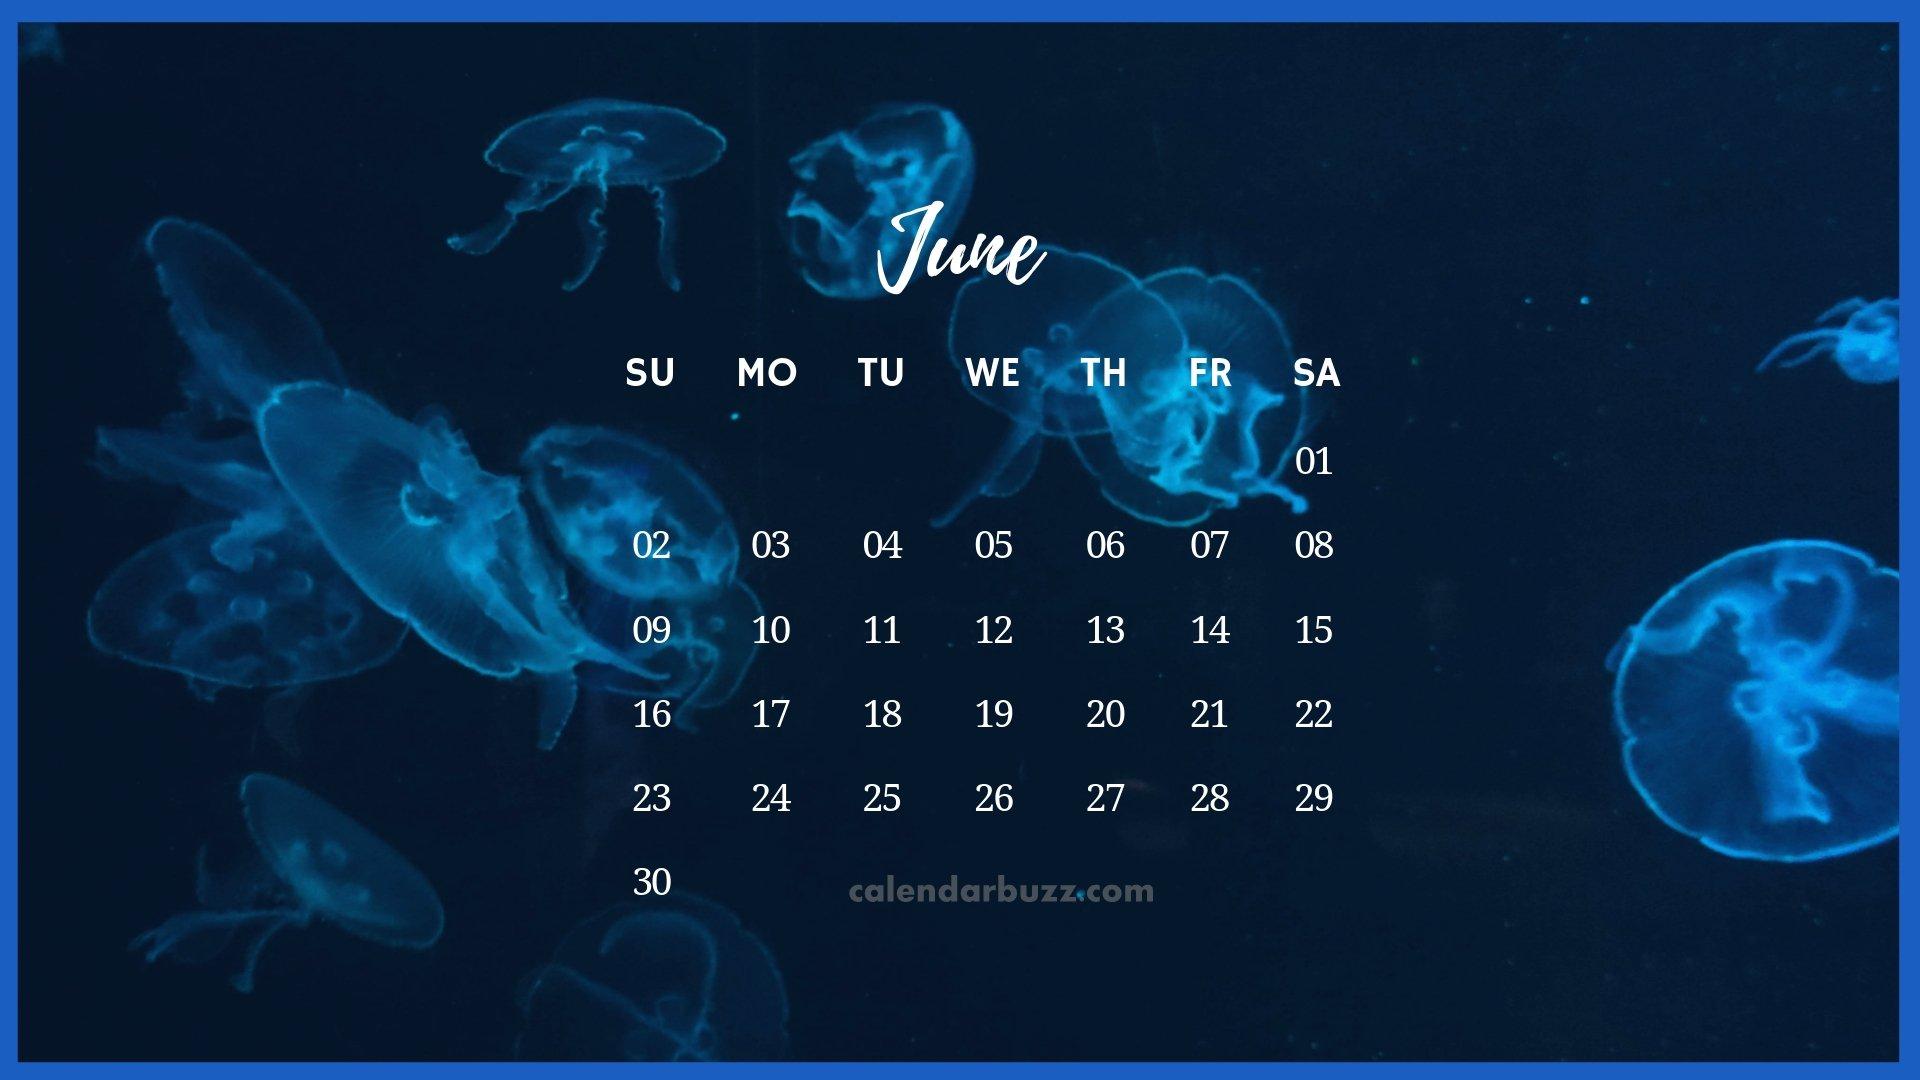 June 2019 Desktop Calendar HD Wallpaper